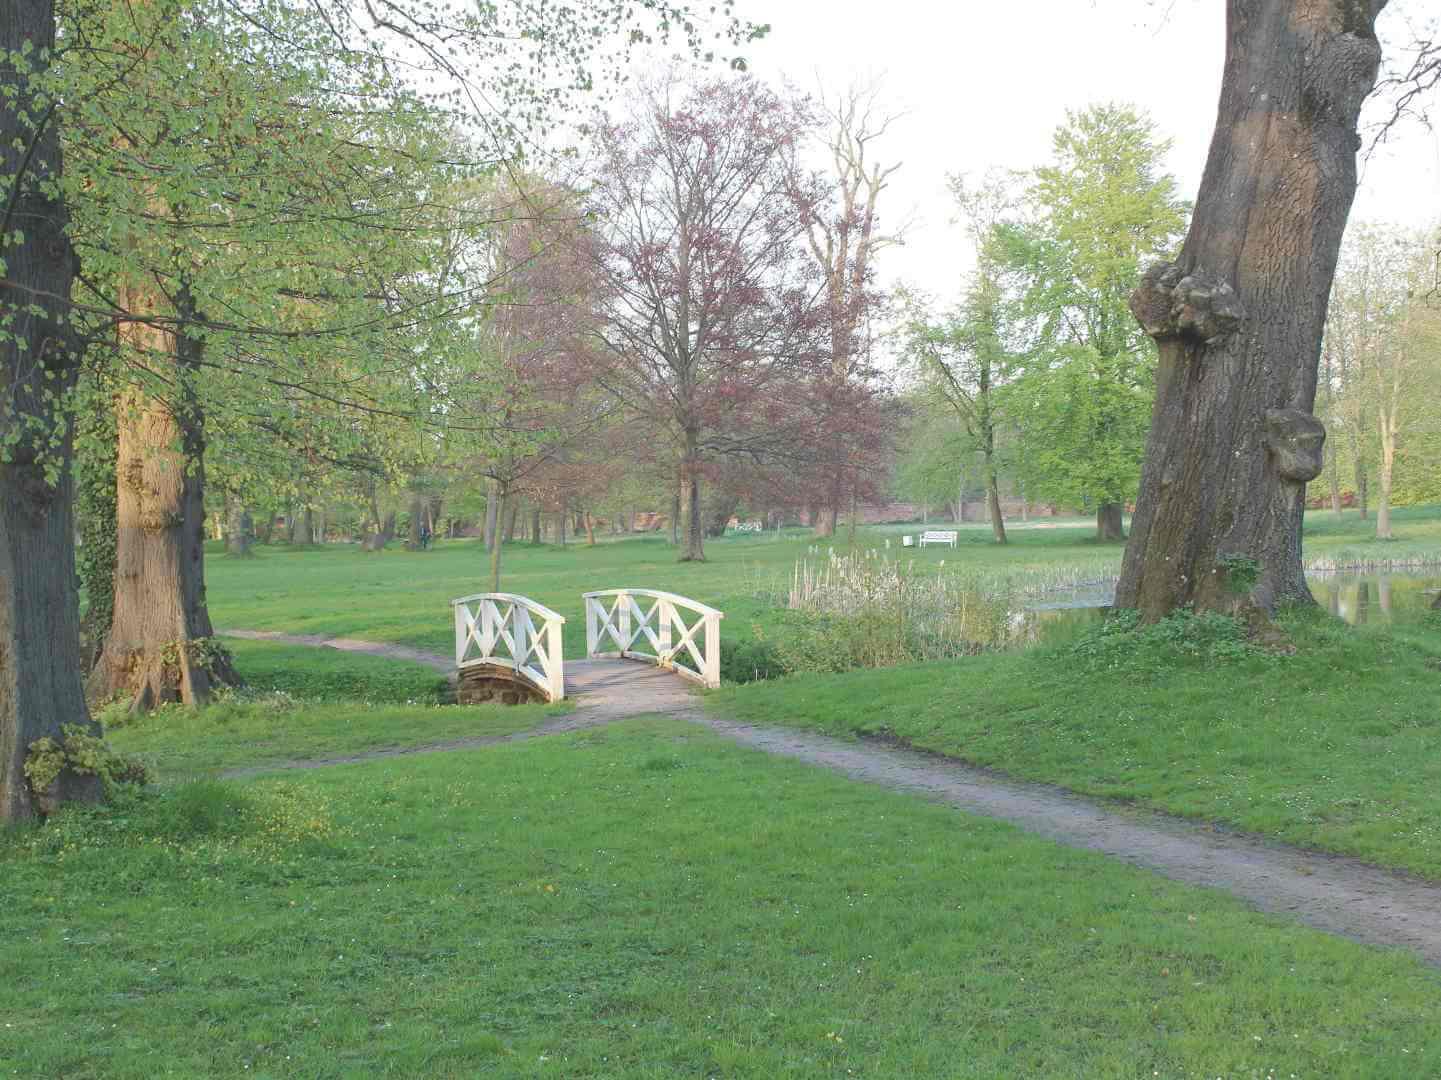 Blick auf Brücke im Klosterpark in Bad Doberan